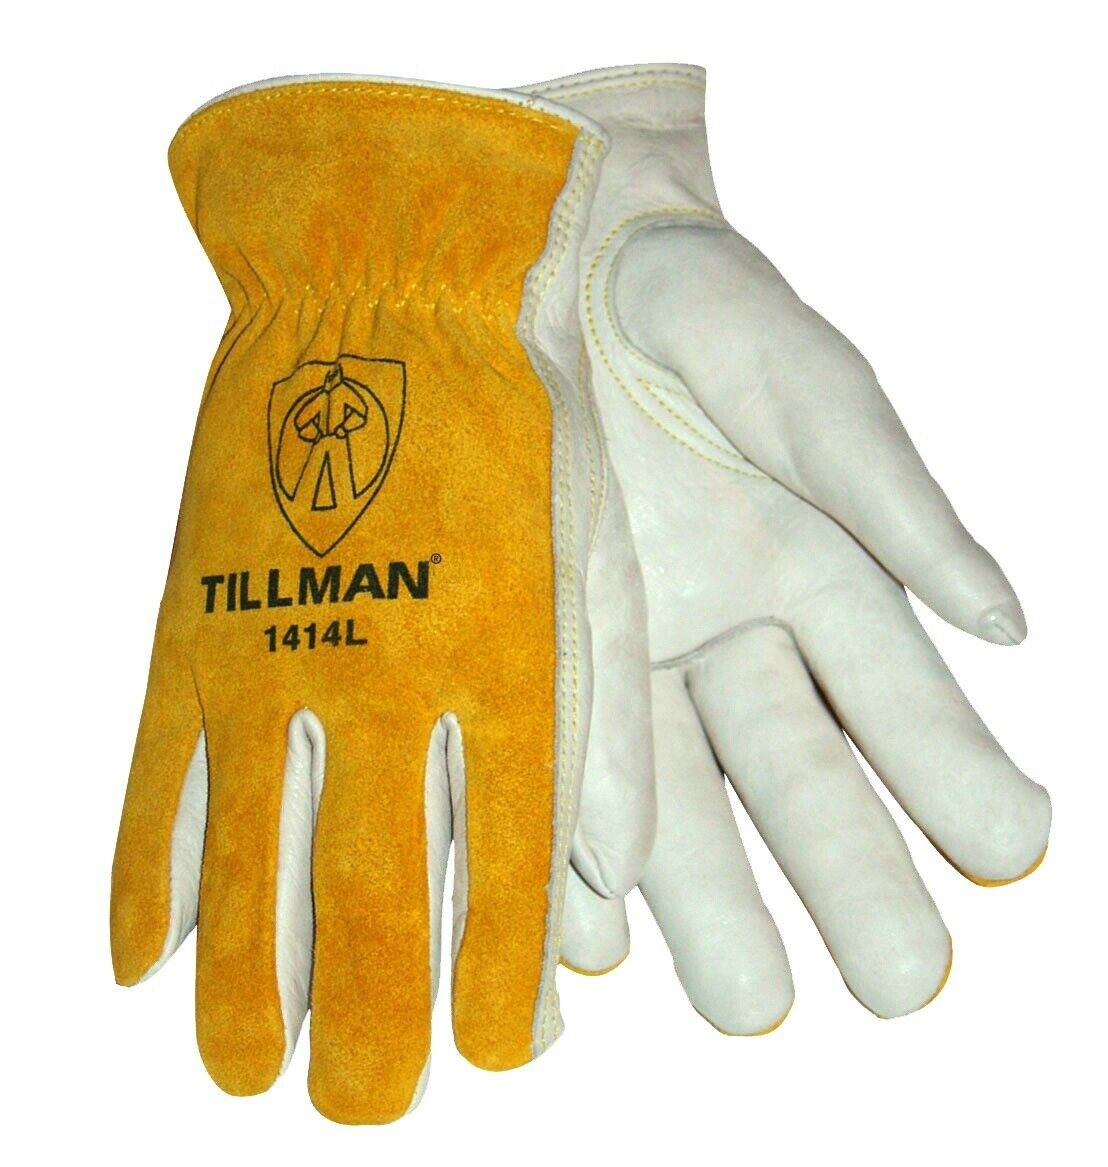 Tillman 1414 Drivers Work Gloves Top Grain Pearl CowhideSplit Leather Back XS-XL Business & Industrial